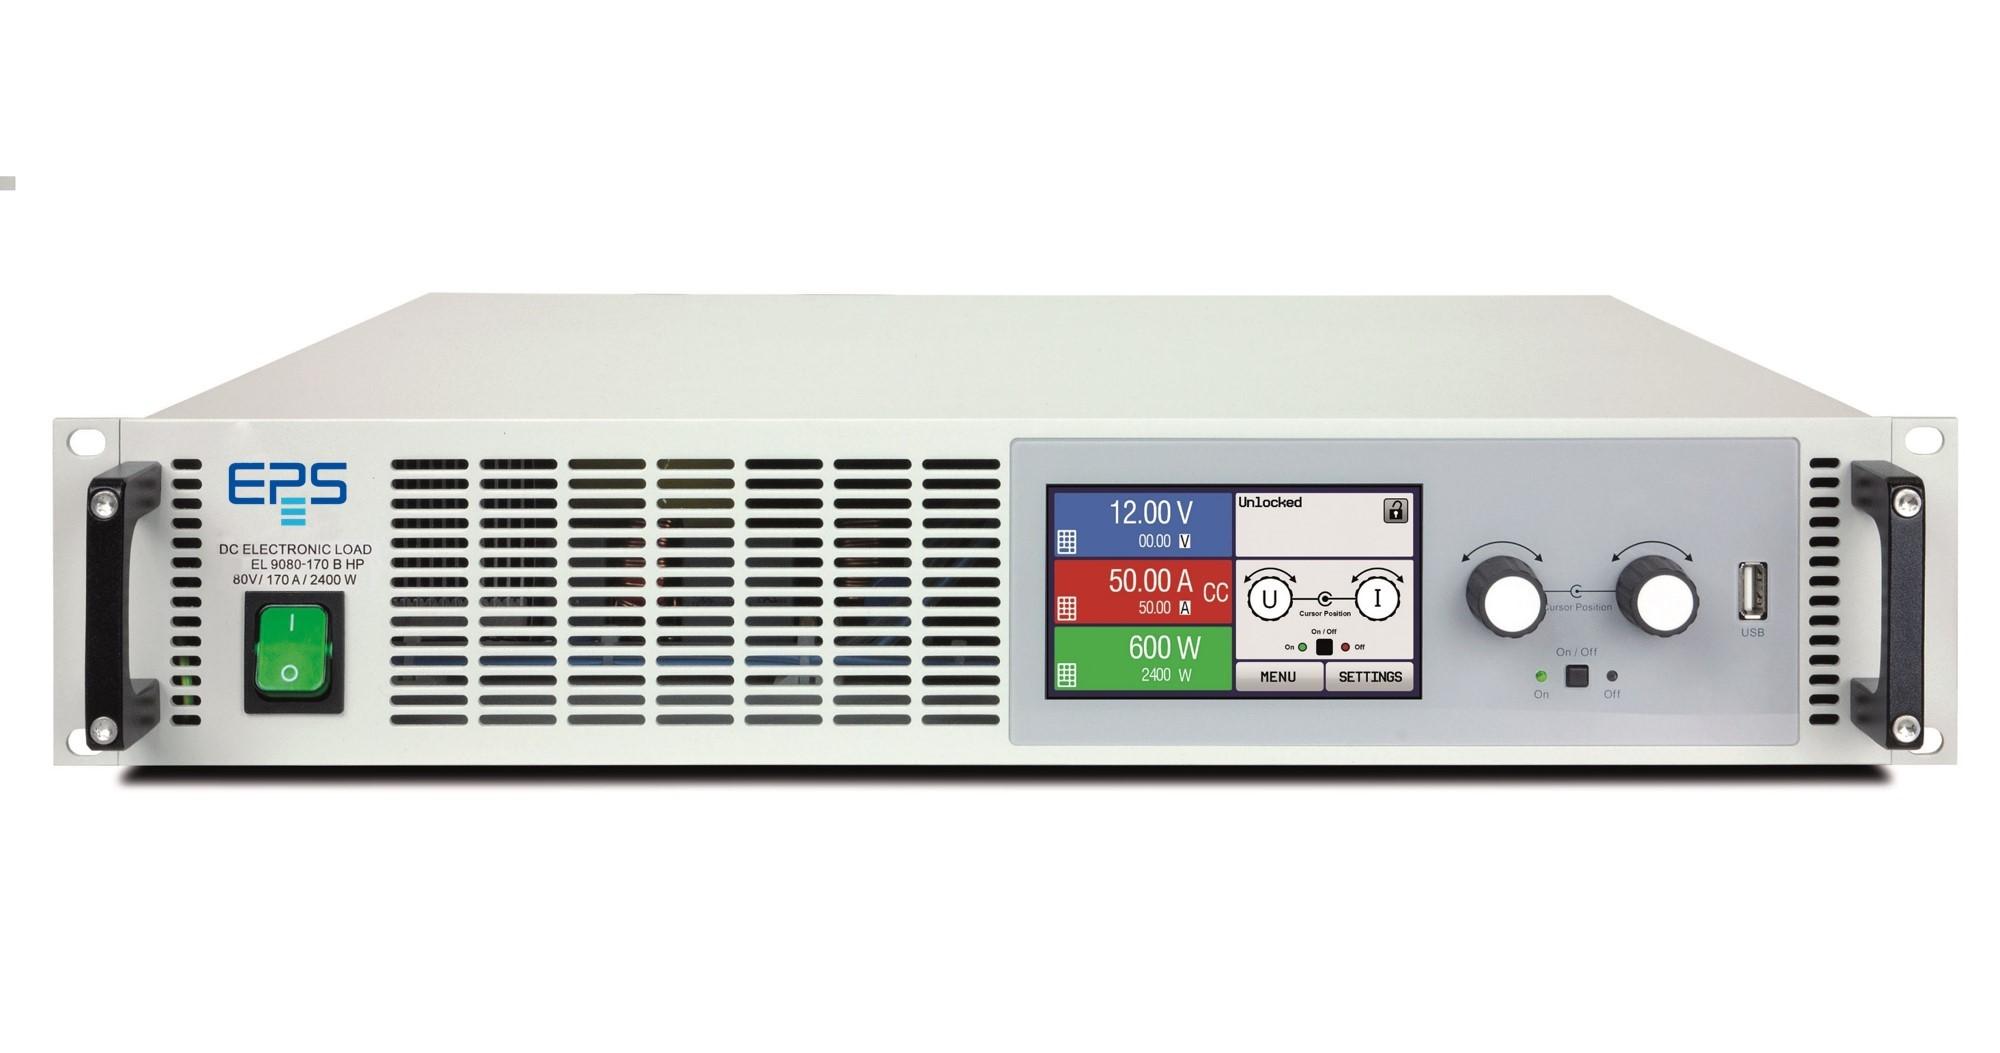 EPS/EL 9750-20B-HP 2U Elektronische Last